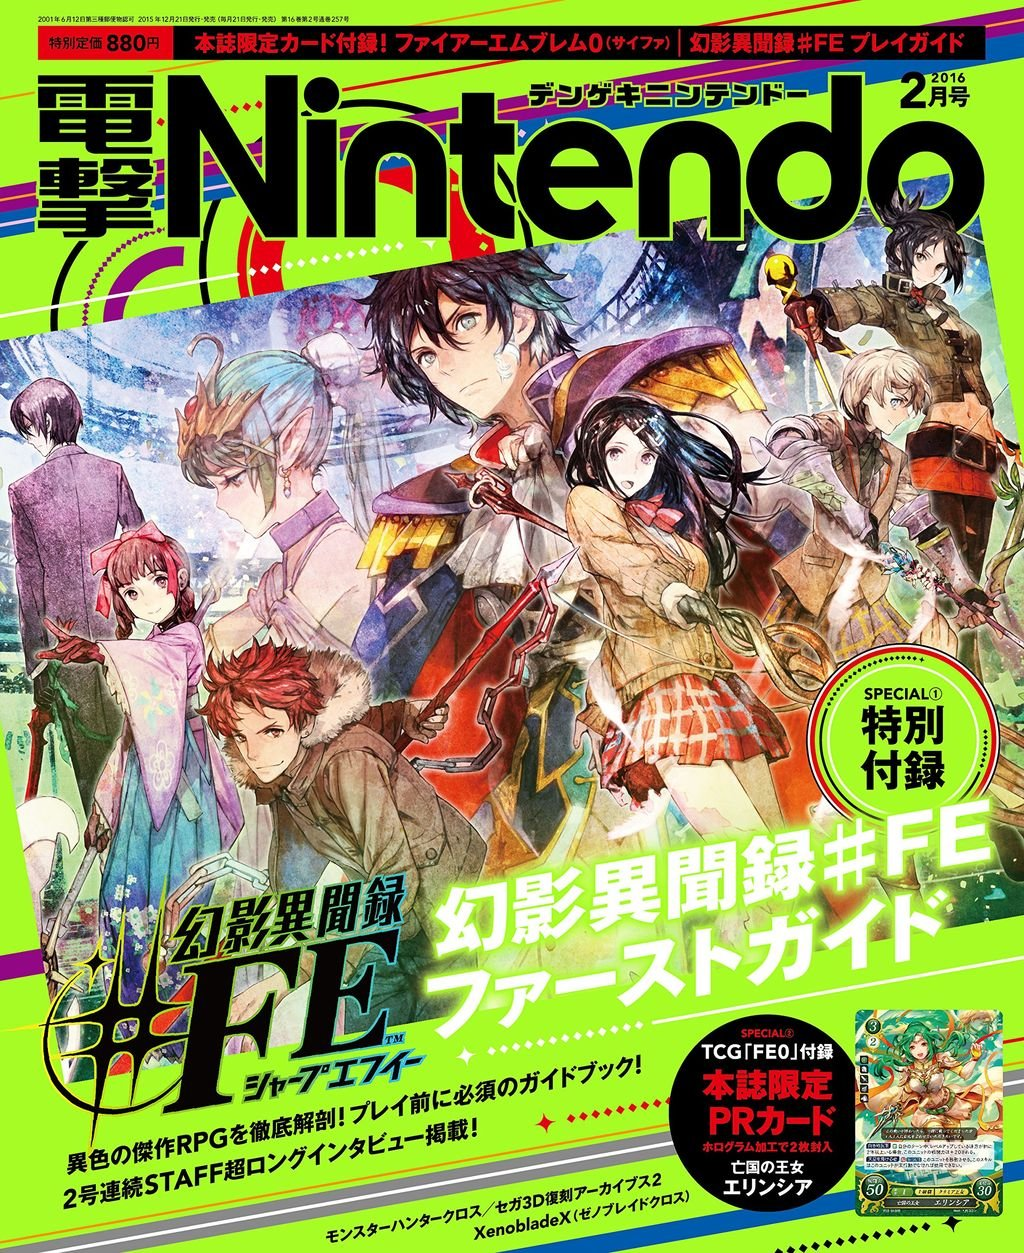 Dengeki Nintendo Issue 033 (February 2016) (print edition)